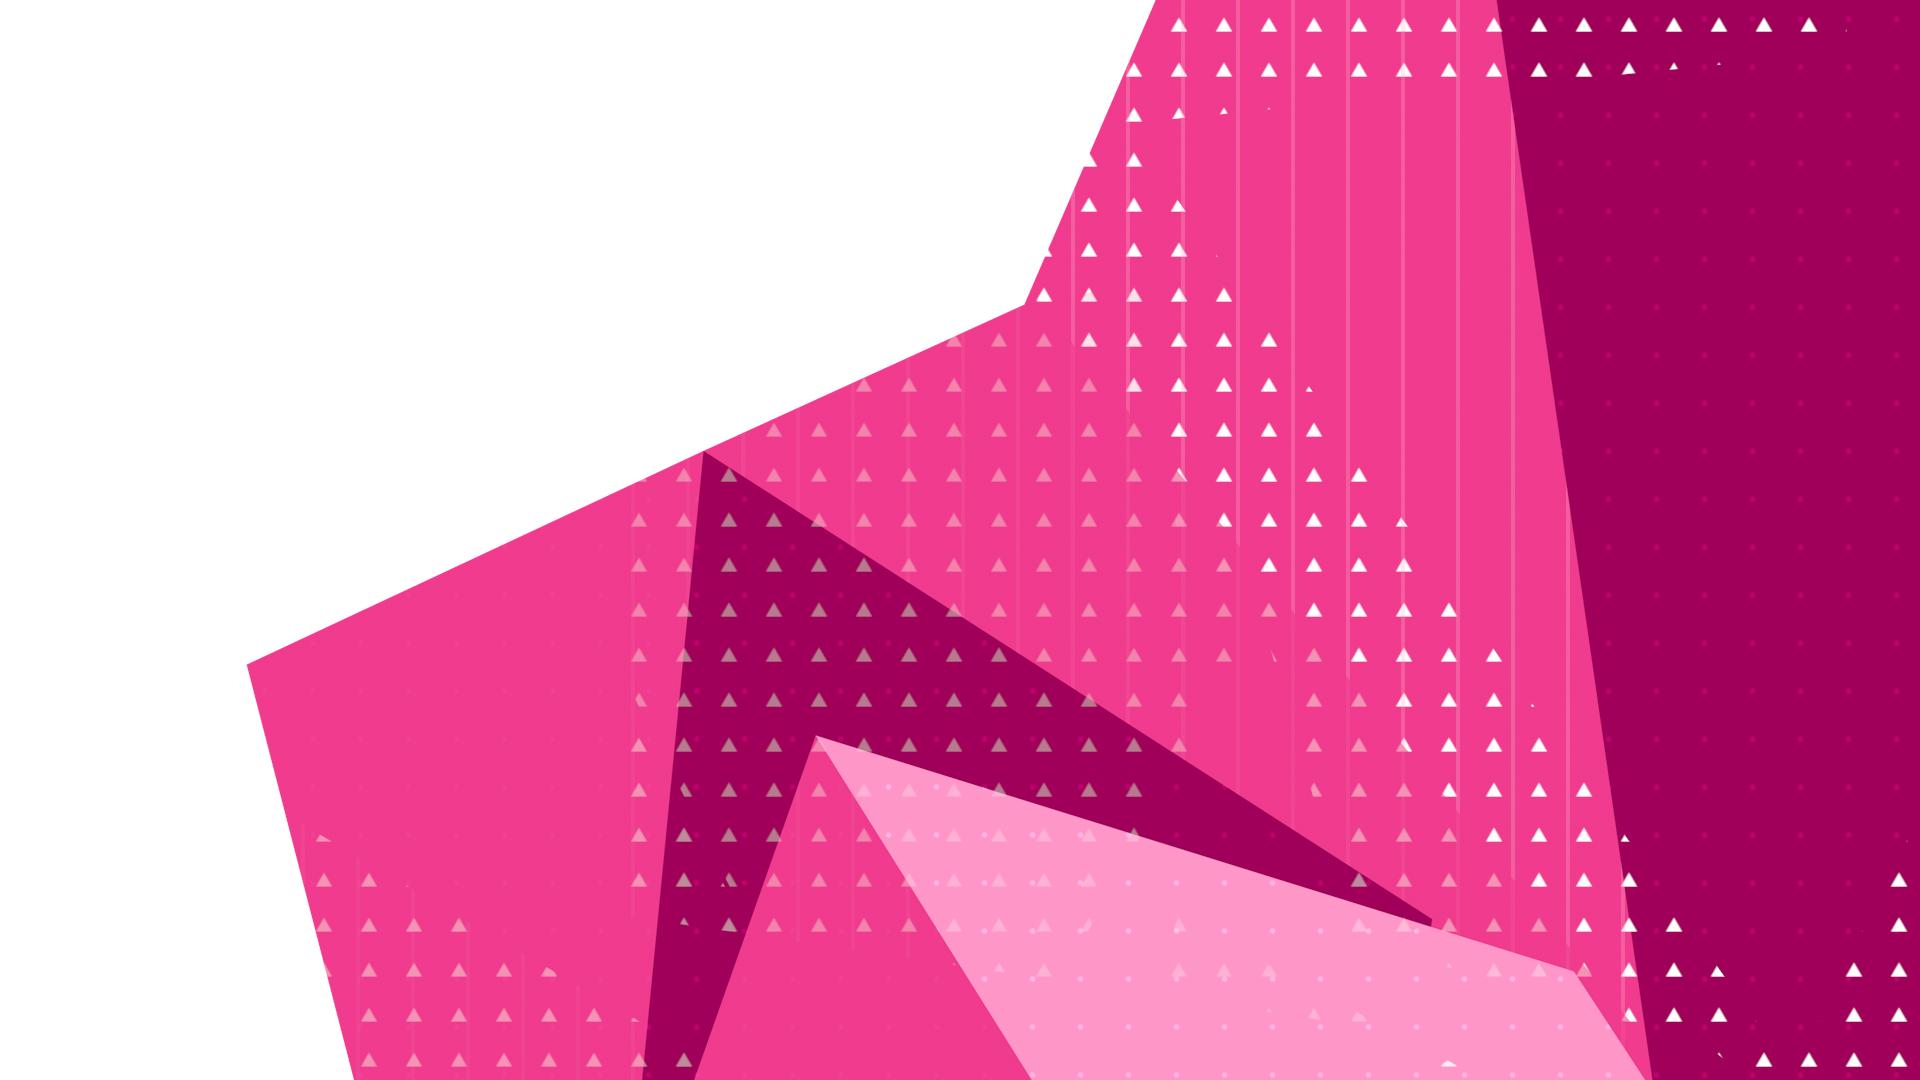 wipe_3_pink121